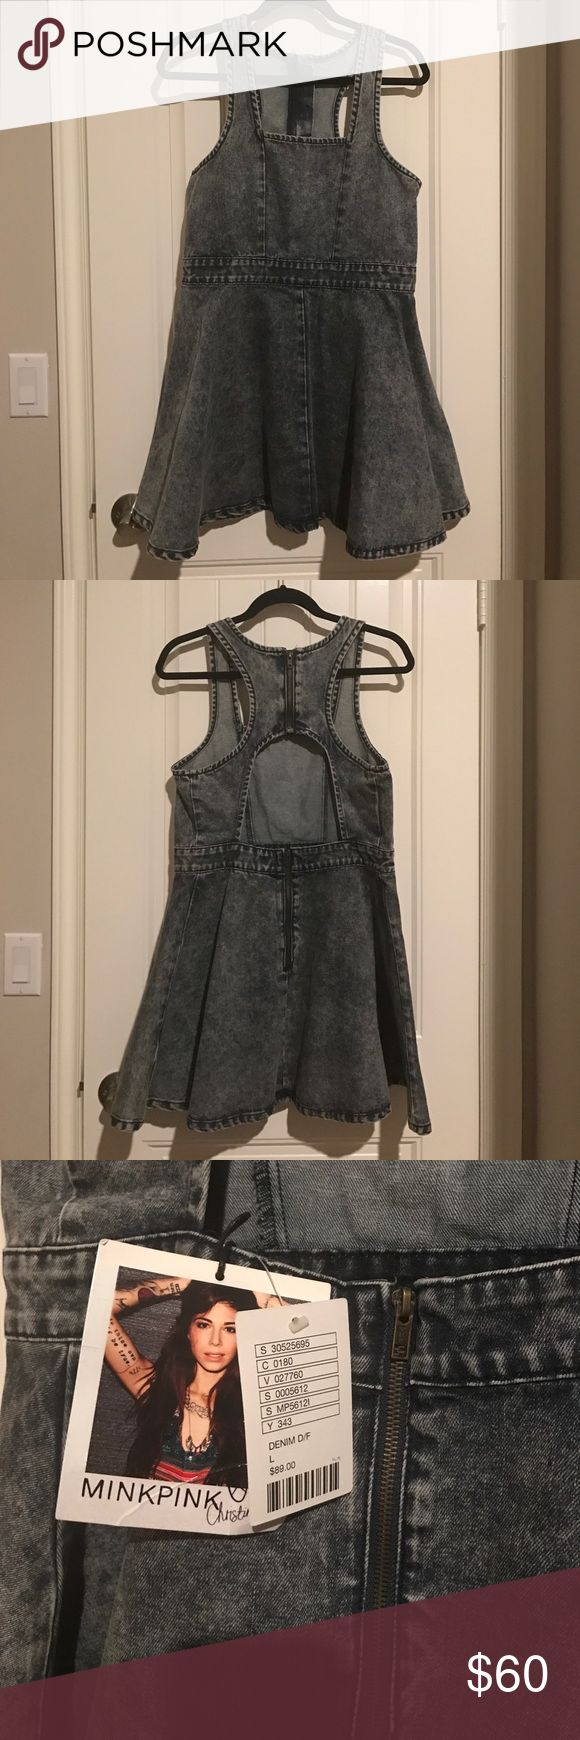 Acid wash denim skater dress NWT Acid wash skater dress. Very thick material, really nice!! NWT MINKPINK Dresses Mini